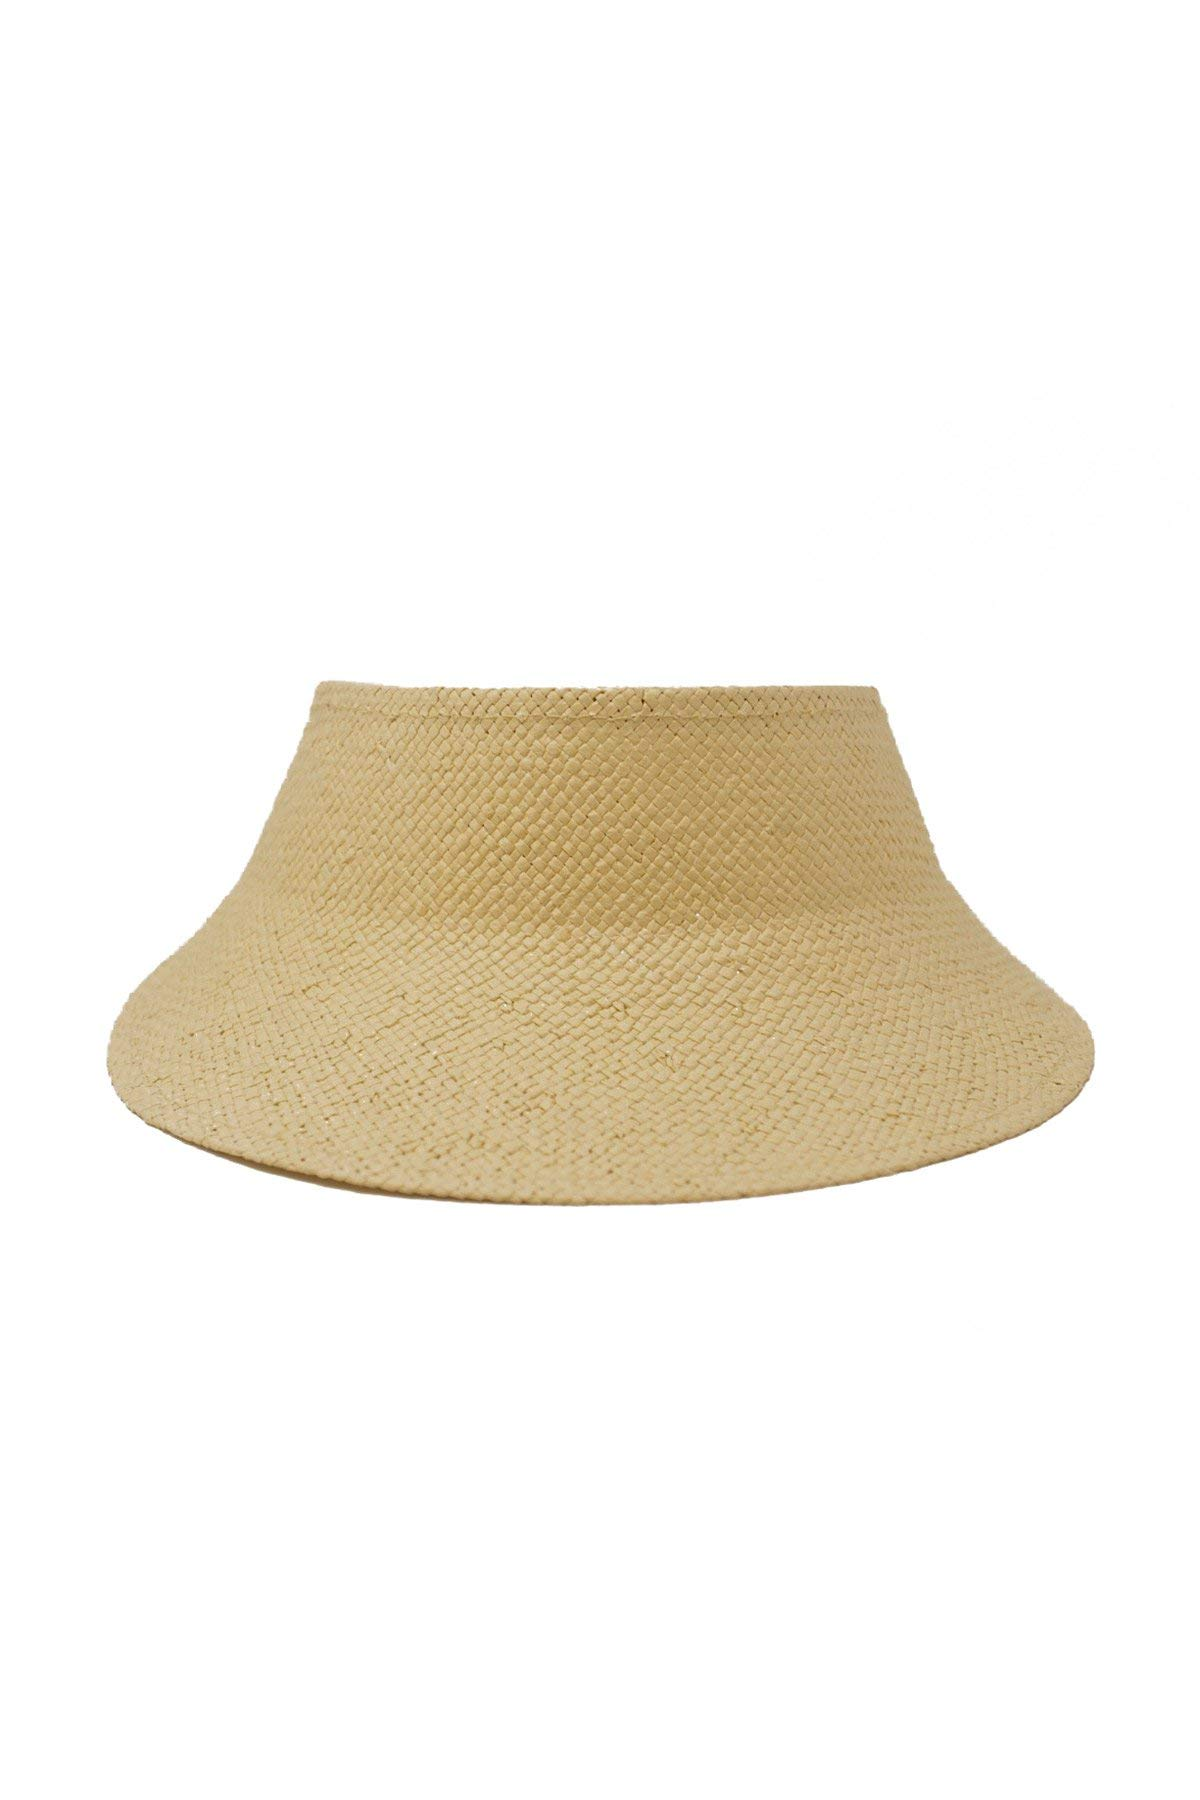 Wyeth Hats Women's Woven Straw Sun Visor Natural One